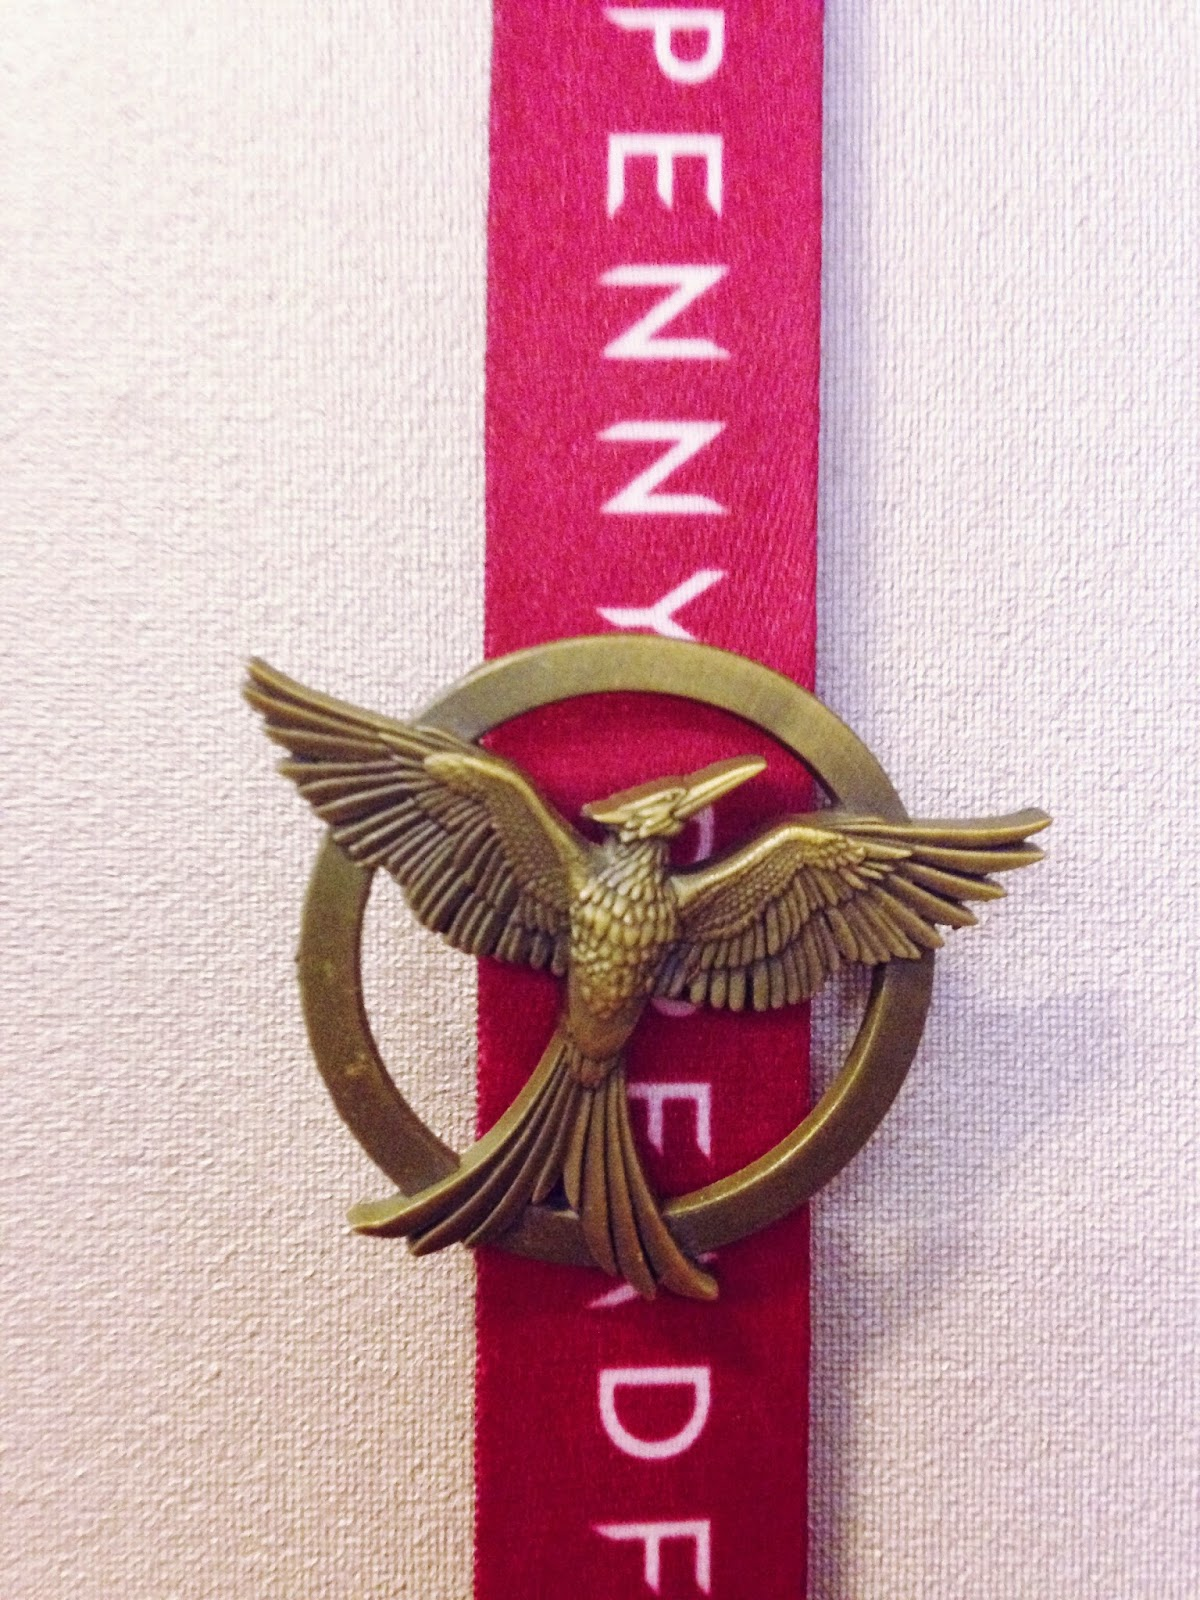 Courtney Tomesch The Hunger Games Mockingjay San Diego Comic Con